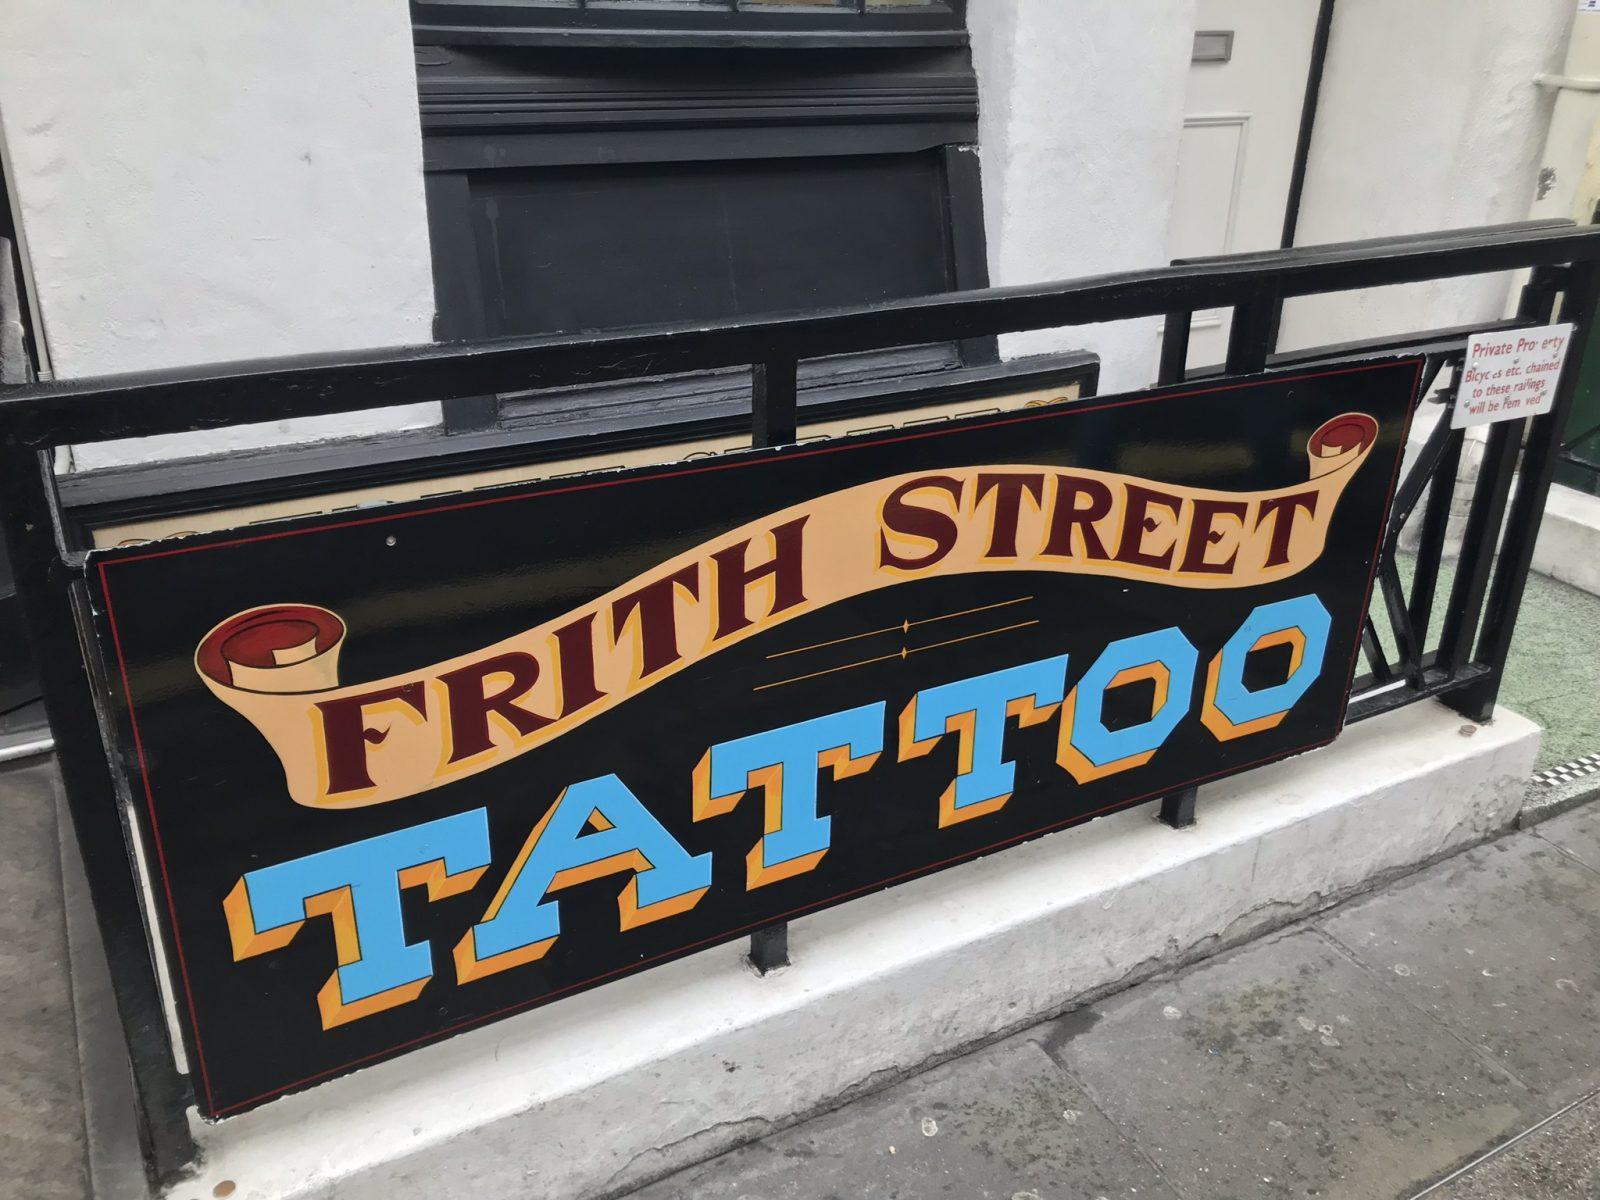 Frith Street Tattoo